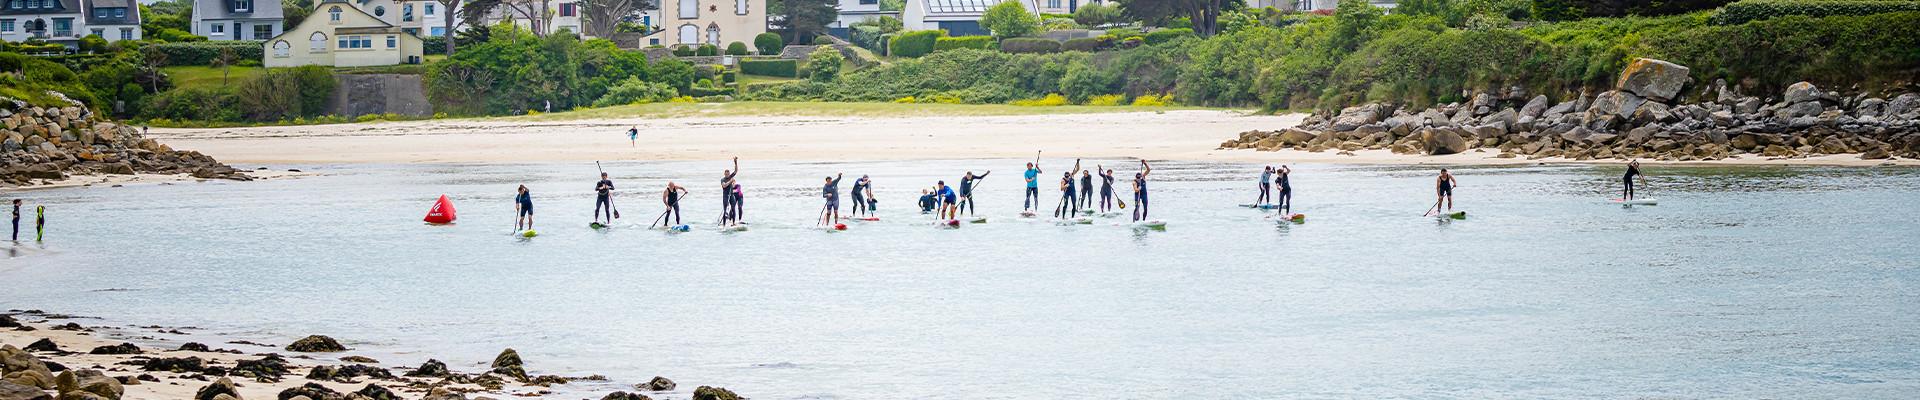 Stand up paddle - SwellAddiction